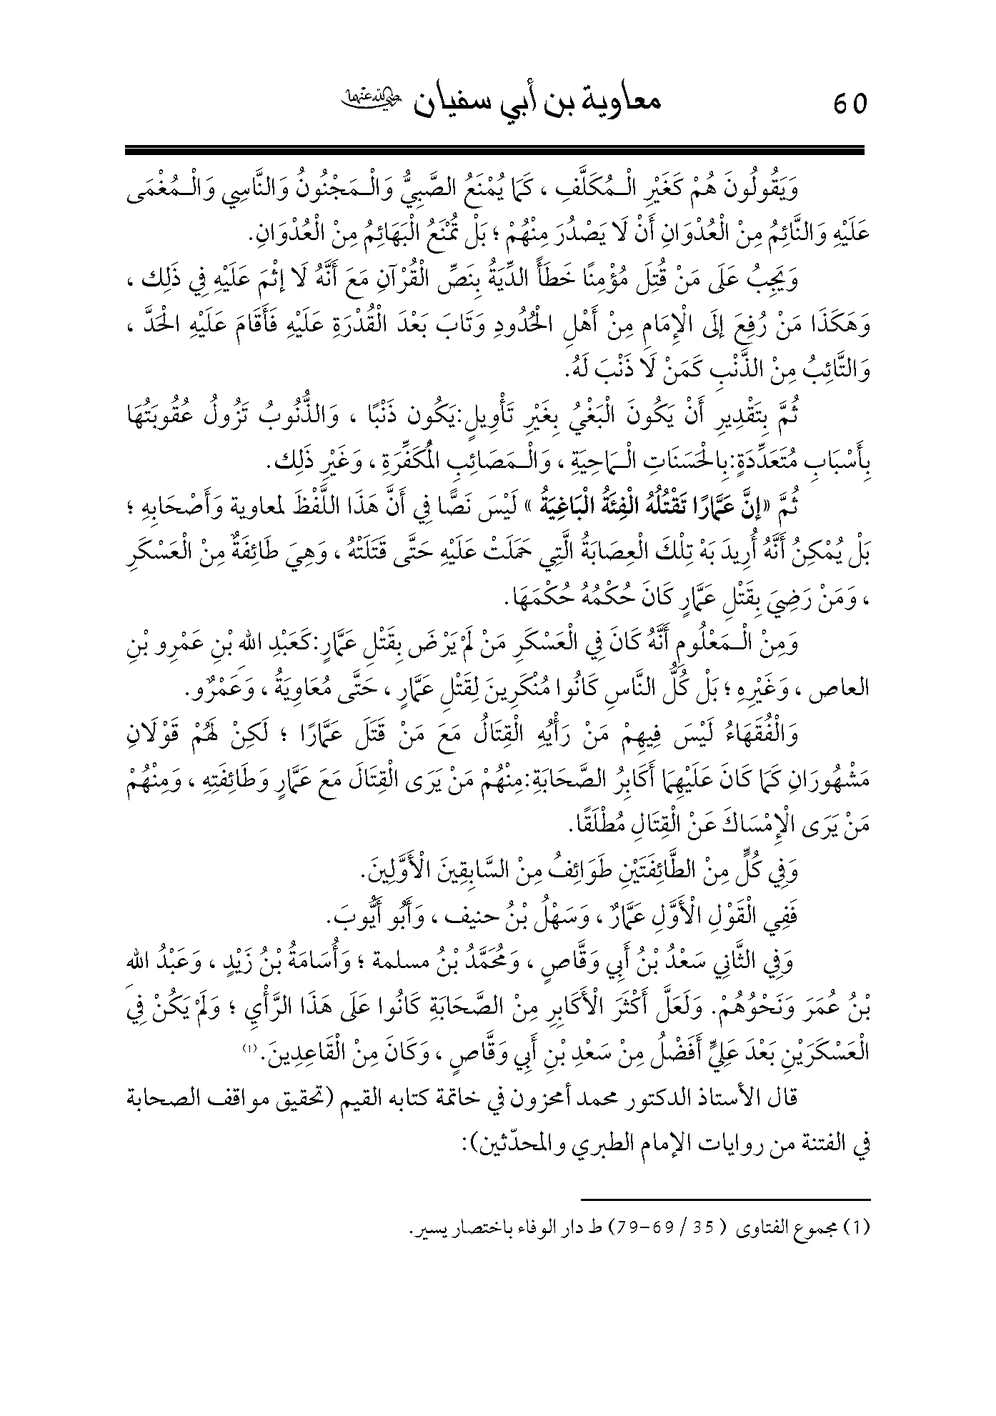 a7be9d076 معاوية بن أبي سفيان رضي الله عنه أمير المؤمنين وكاتب وحي النبي ...